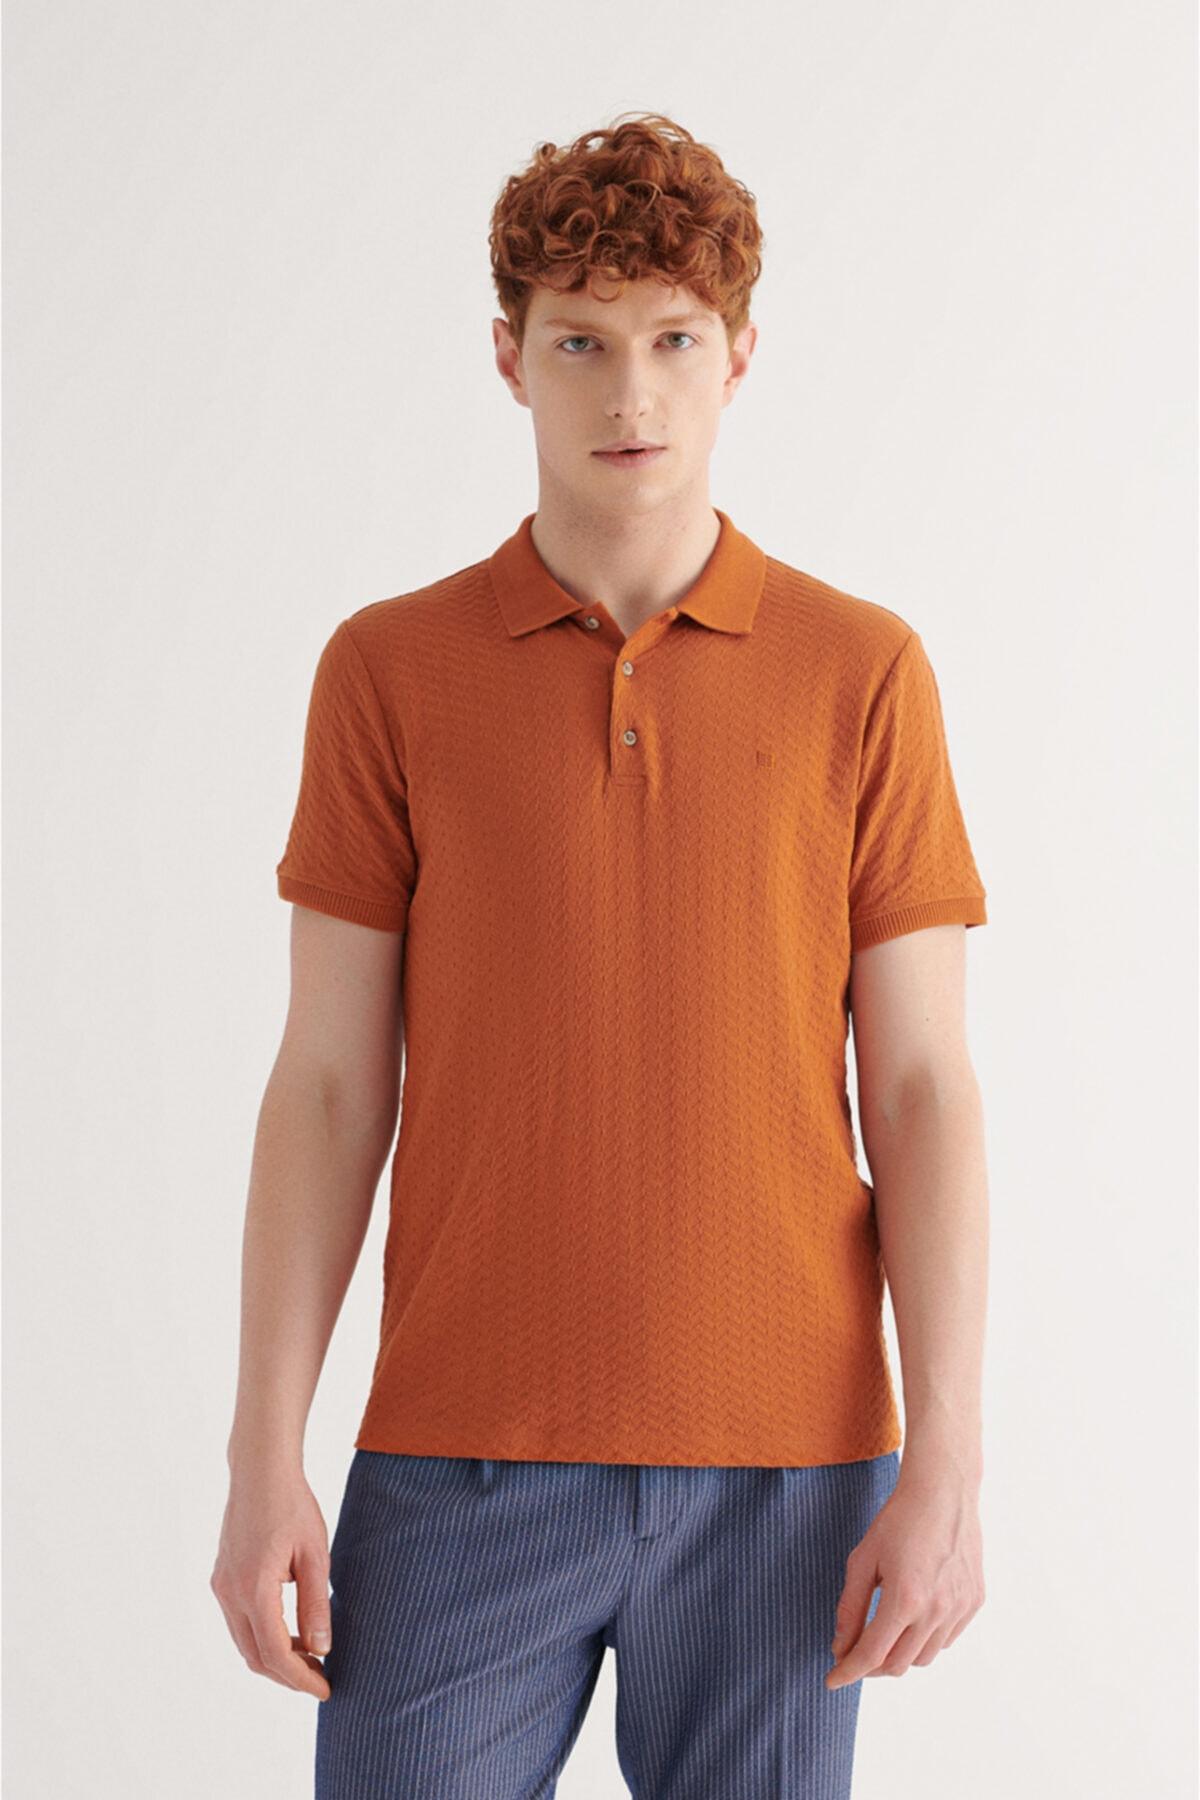 Erkek Kiremit Polo Yaka Jakarlı T-shirt A11y1101